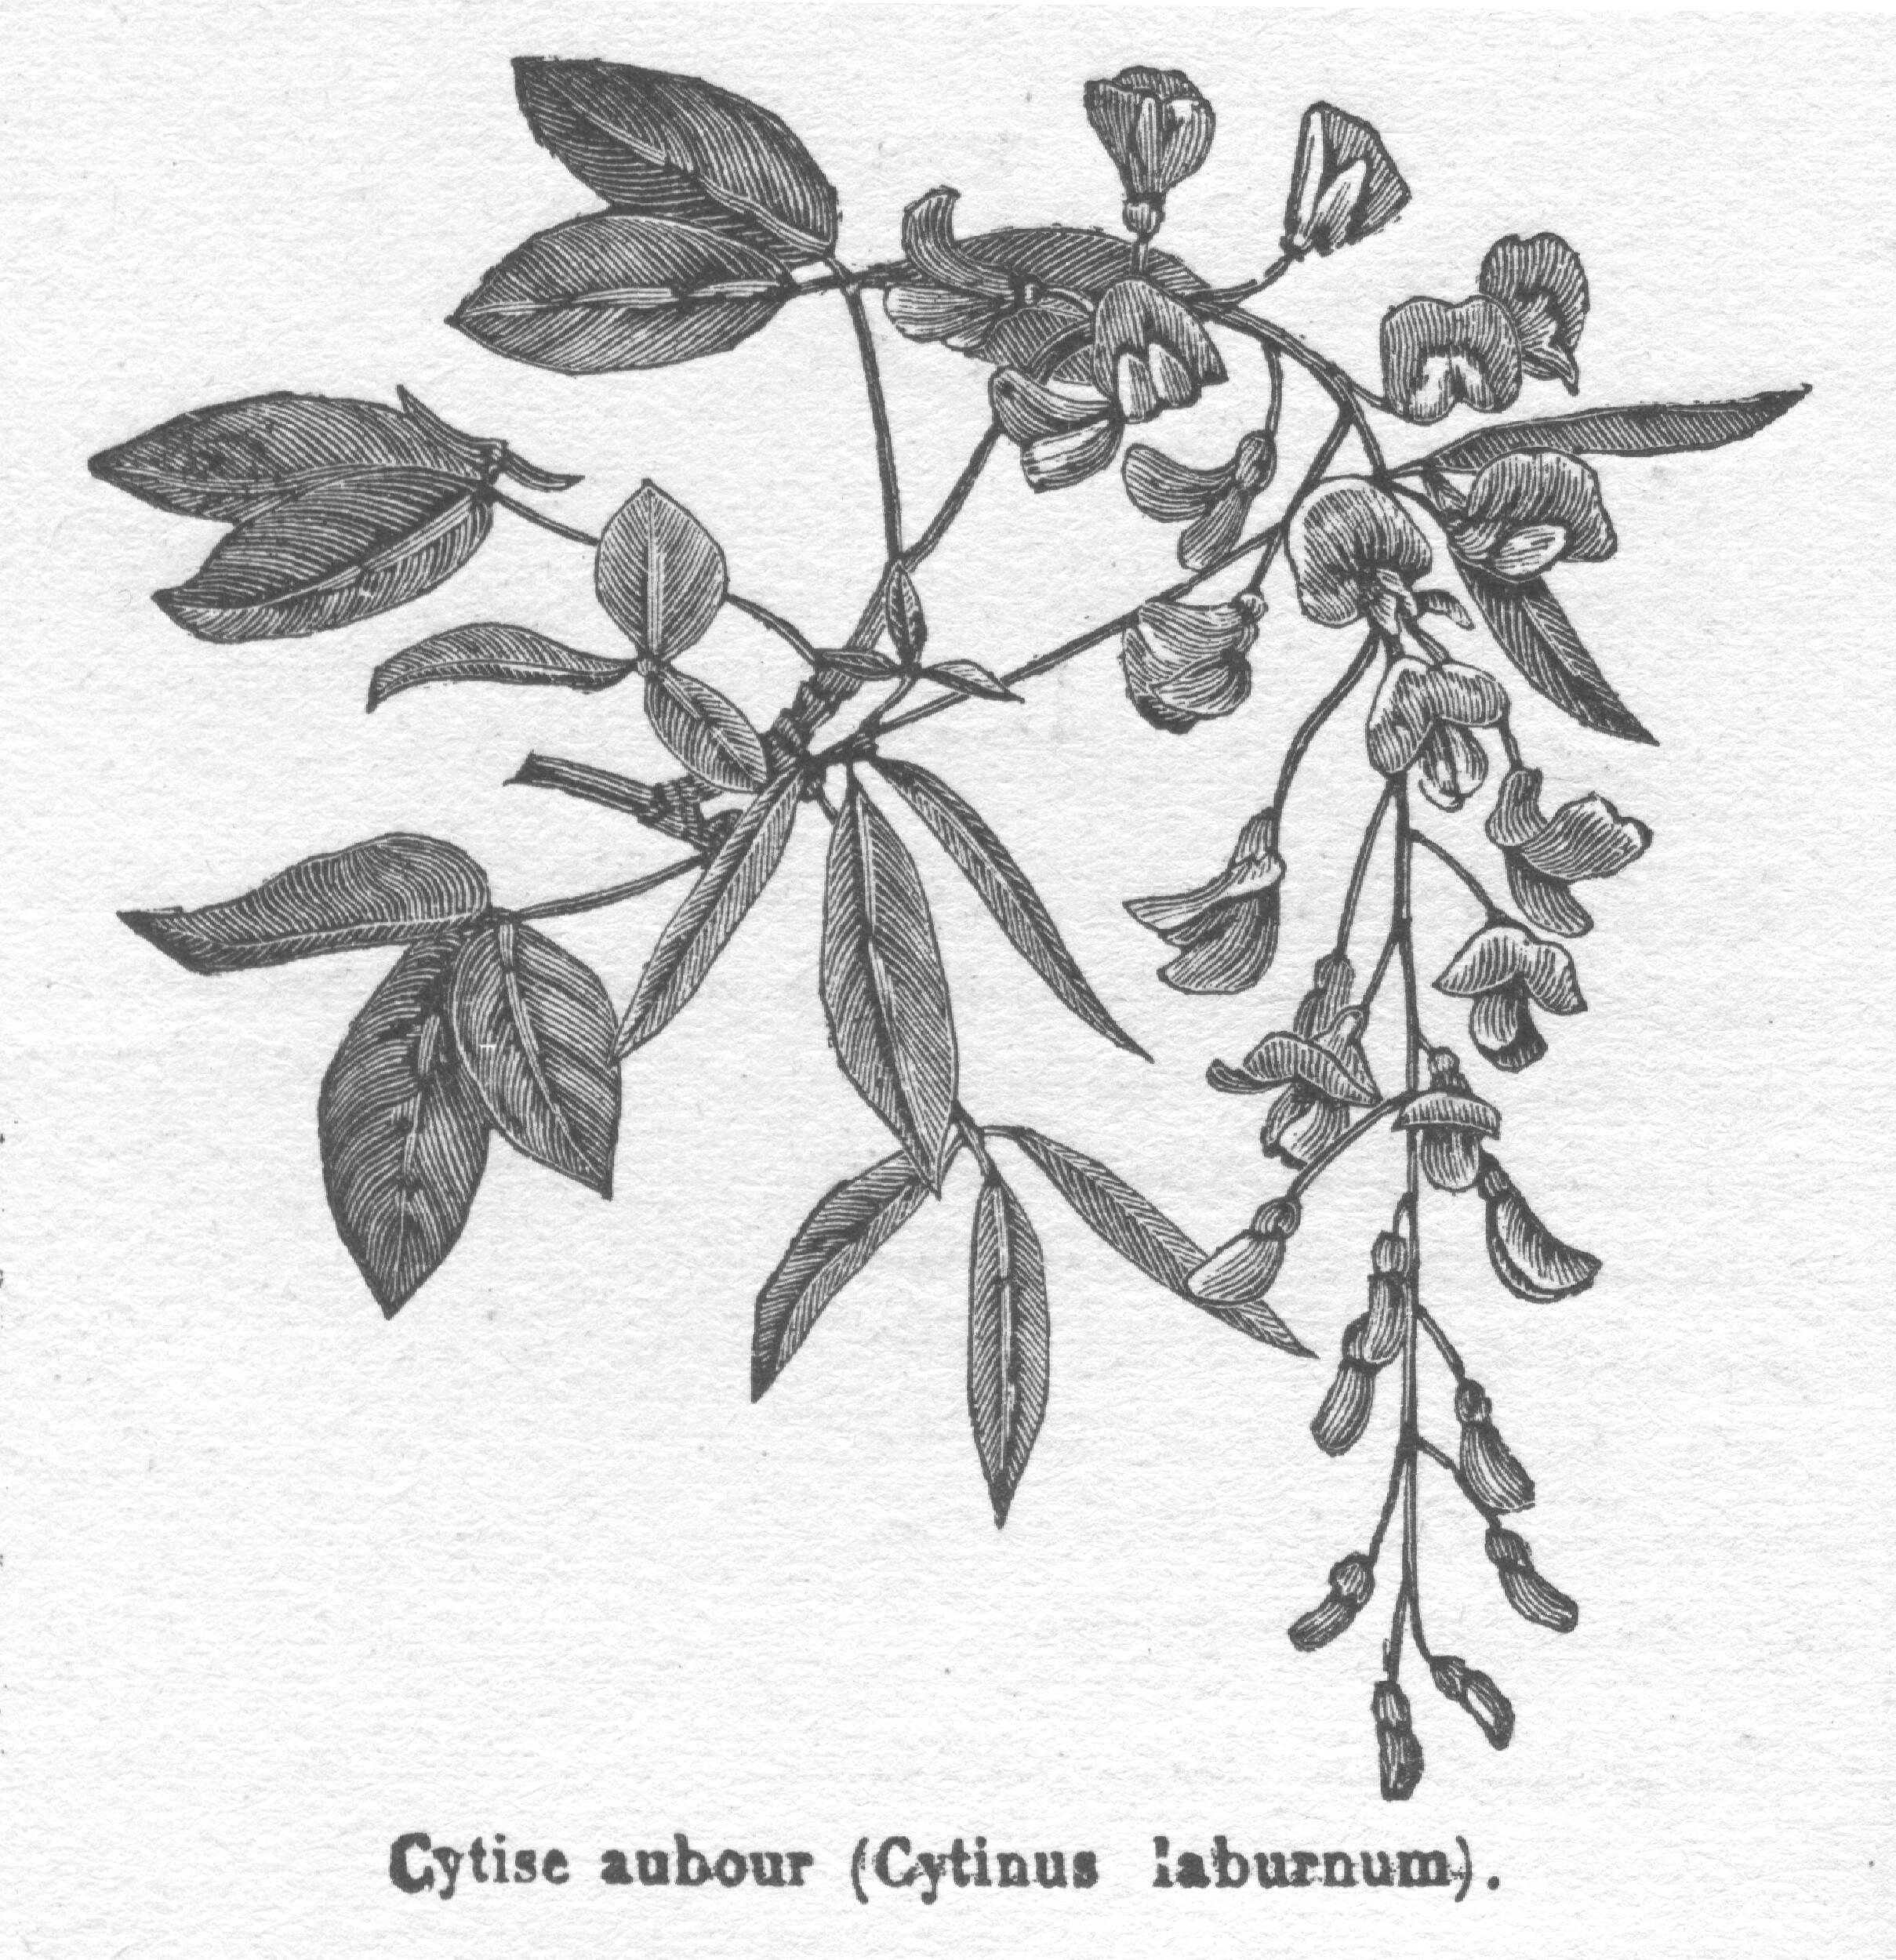 Common Laburnum (Golden Chain Tree)